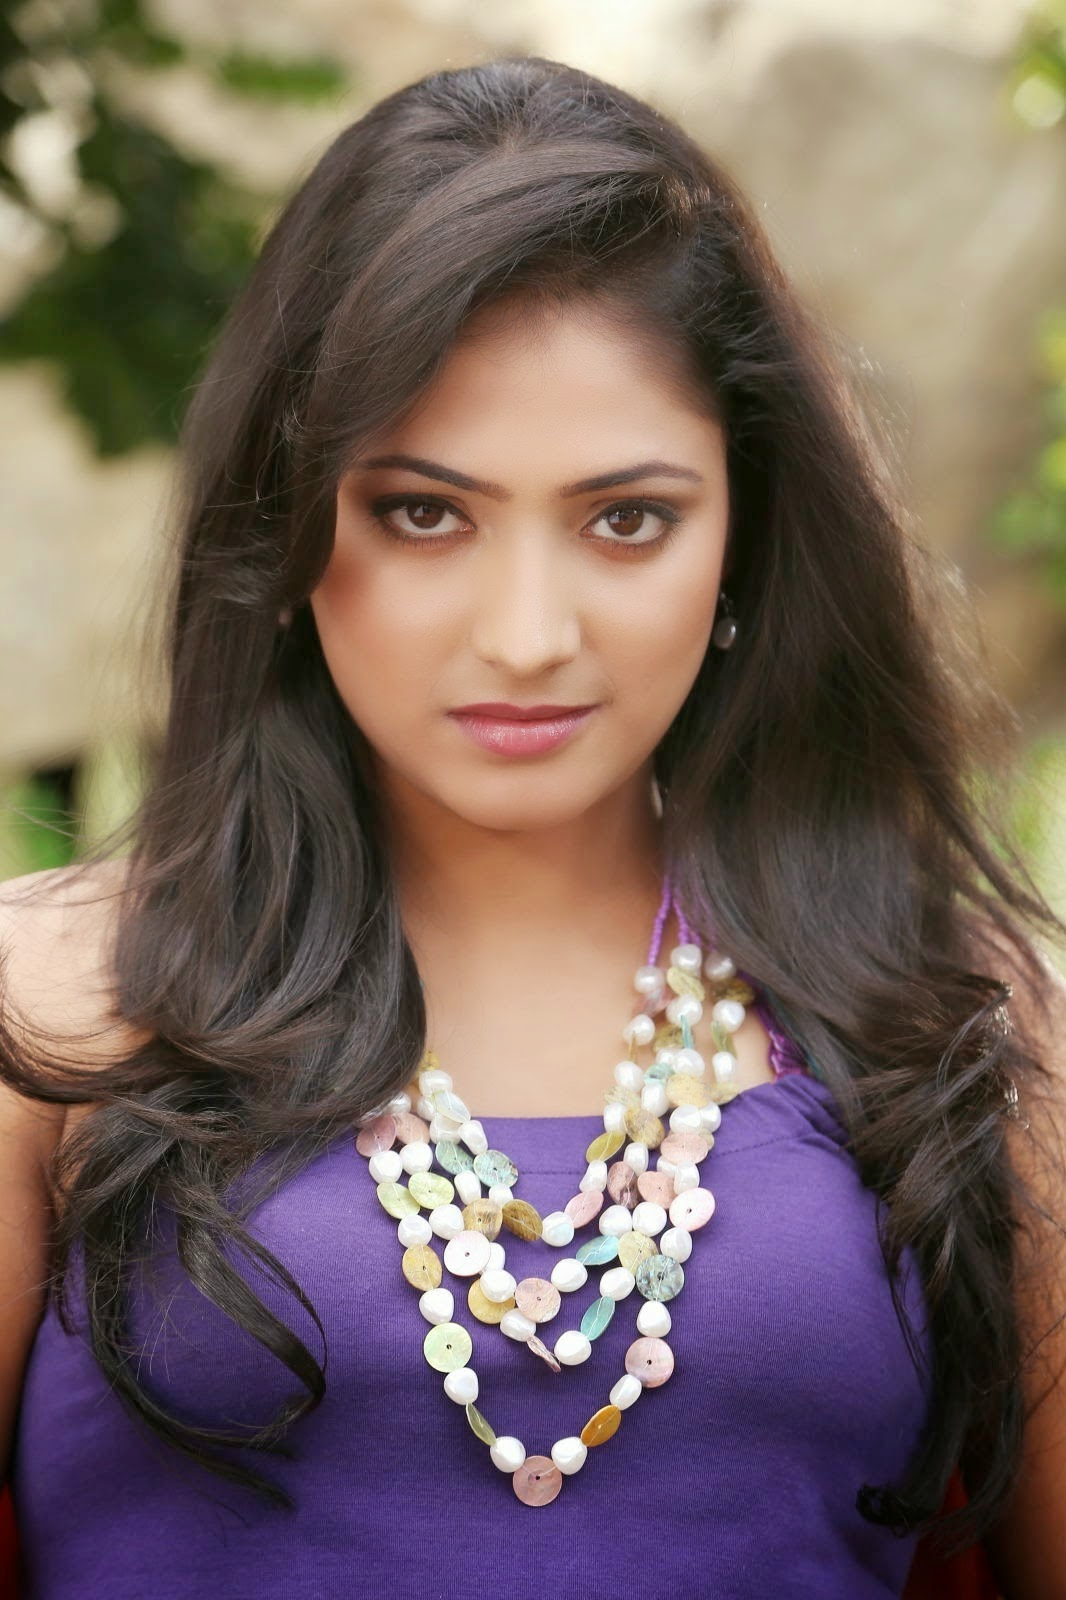 http://actresshdgalleryz.blogspot.in/2014/10/tollywood-actress-haripriya-latest.html